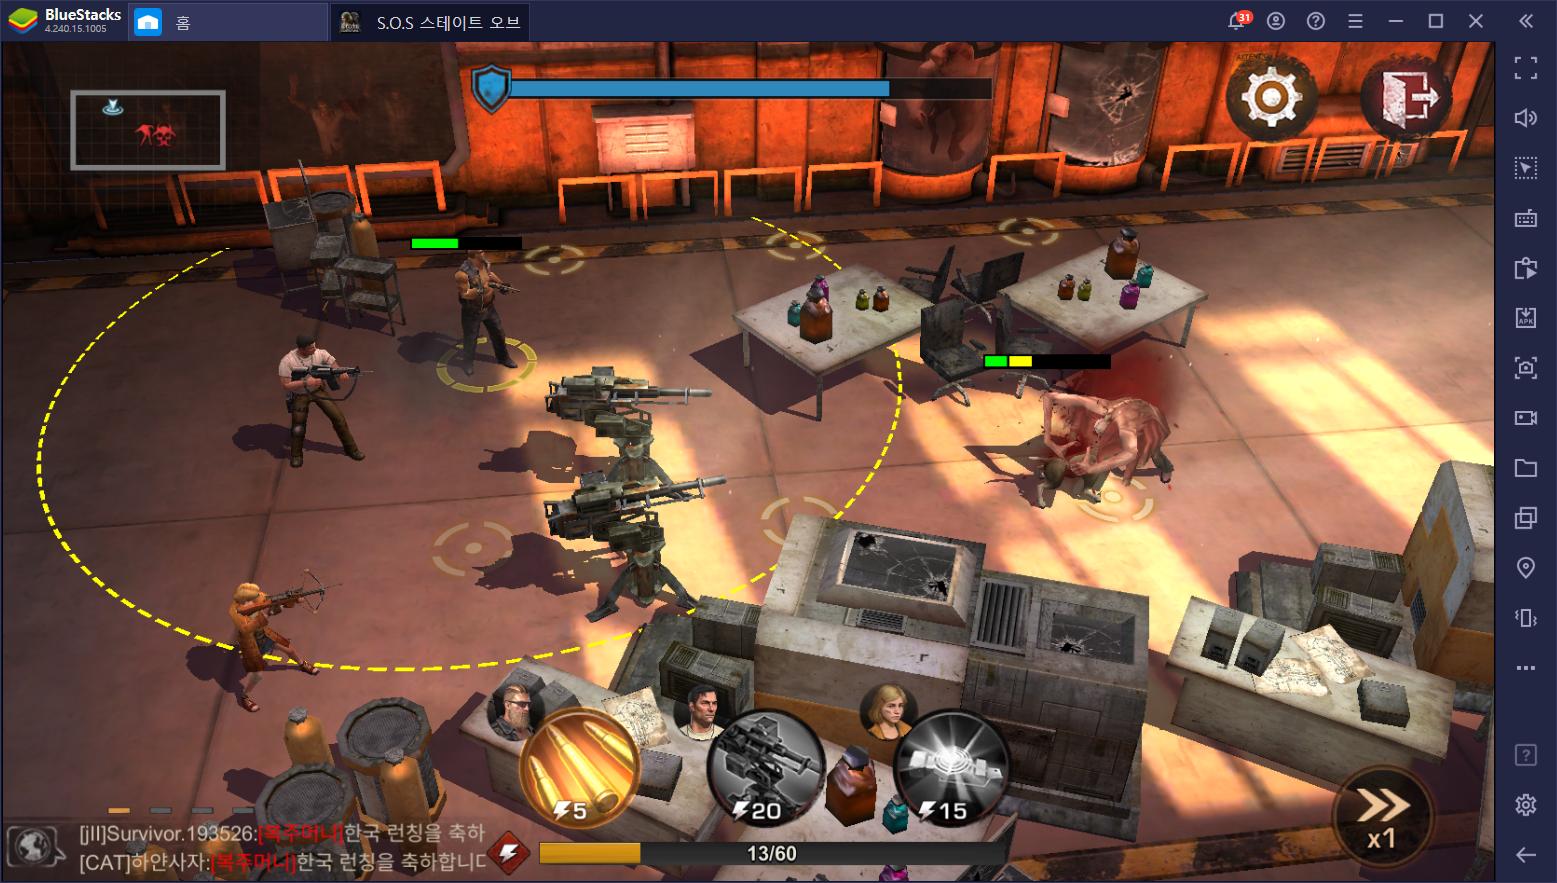 S.O.S:스테이트 오브 서바이벌 영웅 공략하기!